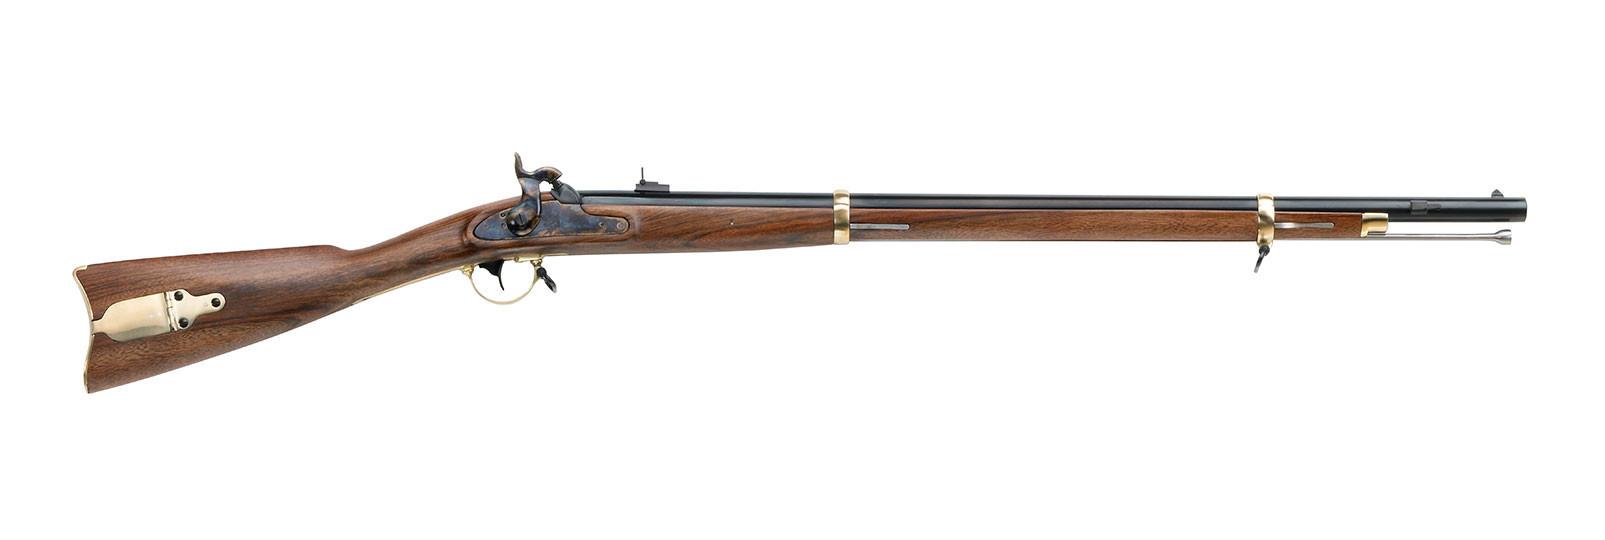 Zouave u.s.model 1863 perc.58